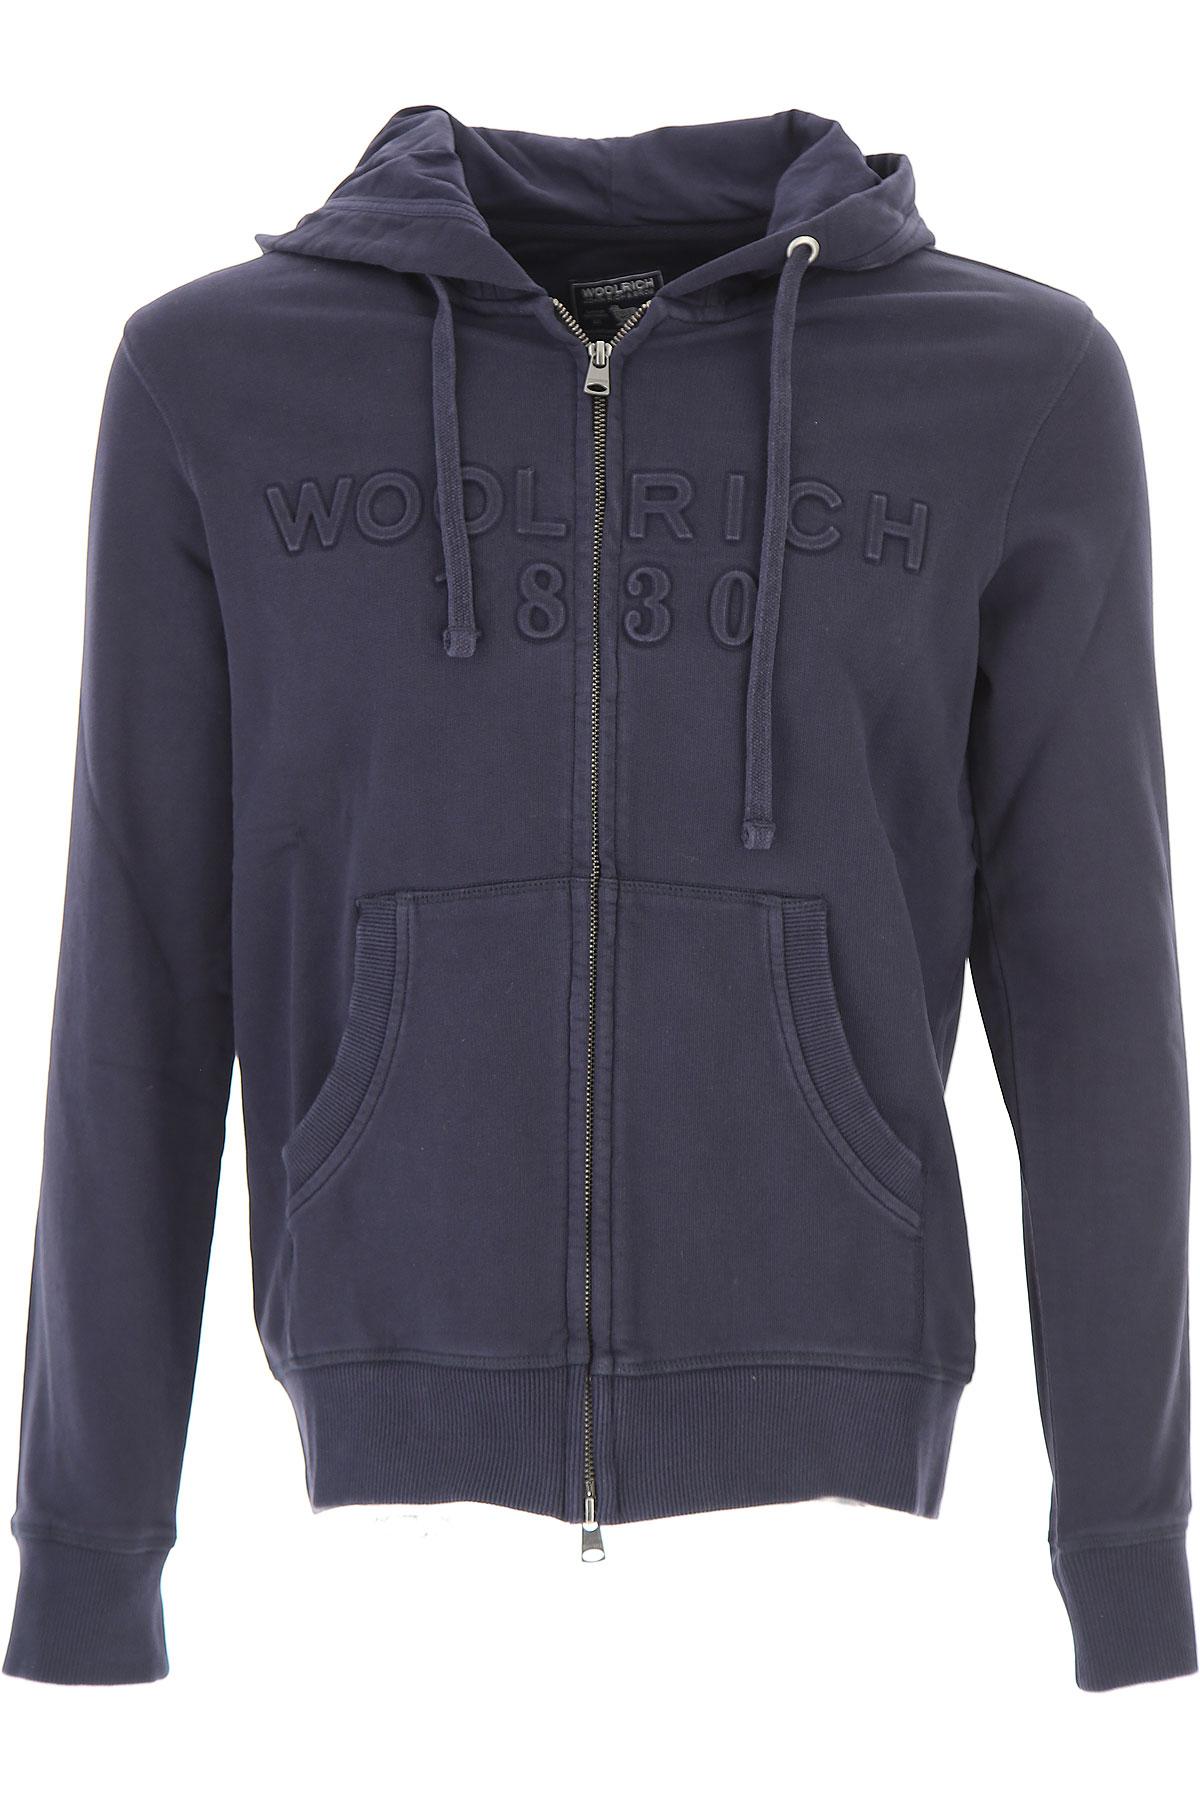 Woolrich Sweatshirt for Men On Sale, Dark Blue, Cotton, 2017, EU M/48 - US S EU L/50 - US M EU XL/52 - US L USA-449461